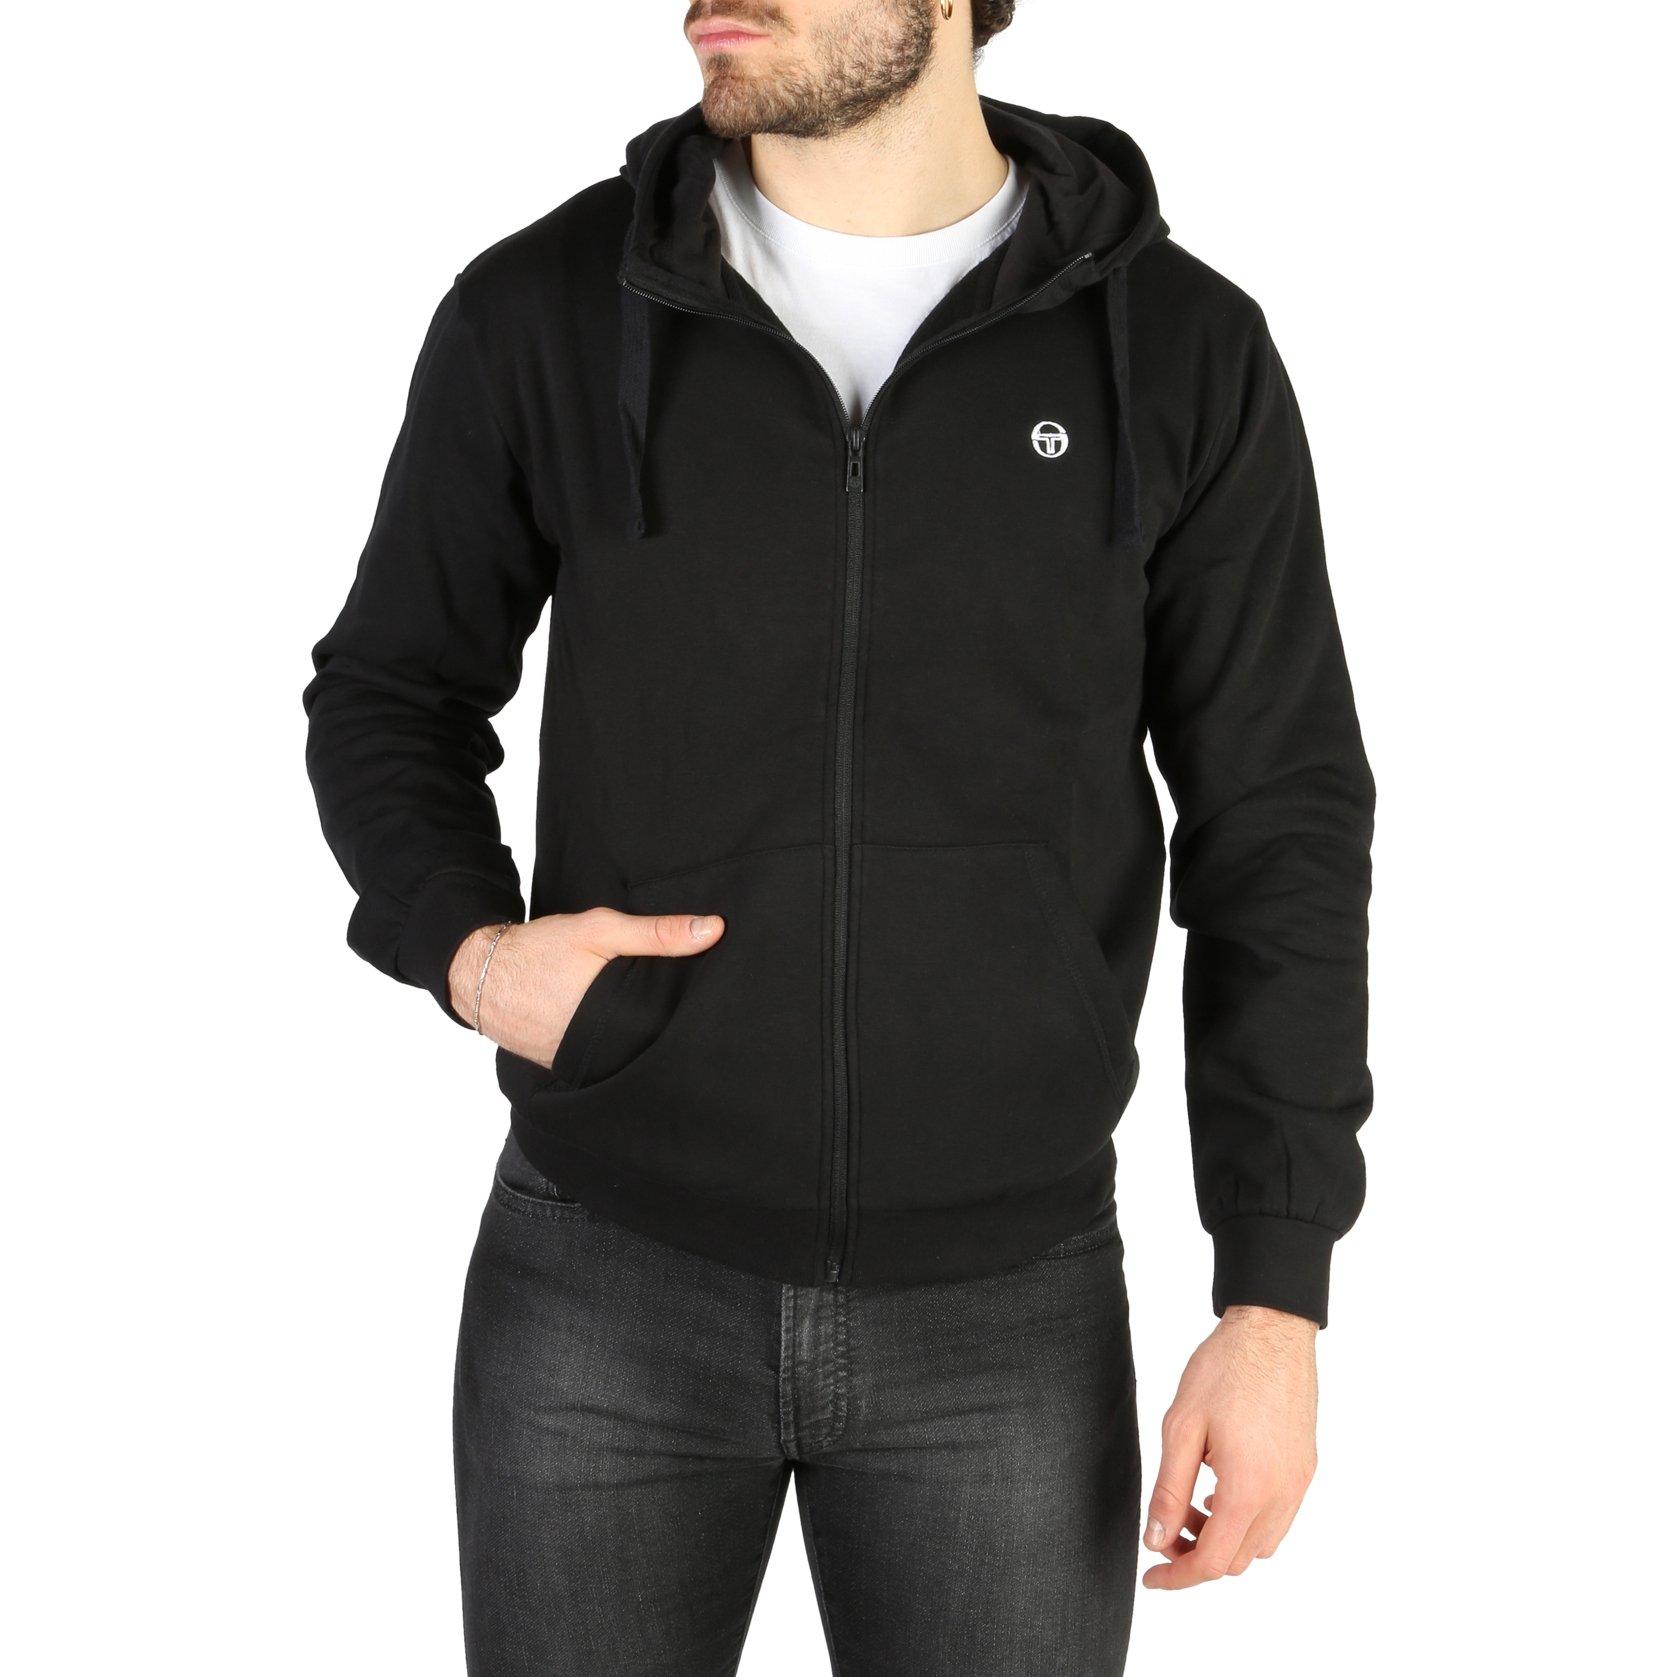 Sergio Tacchini Men's Sweatshirt Various Colours 103-10001 - black S